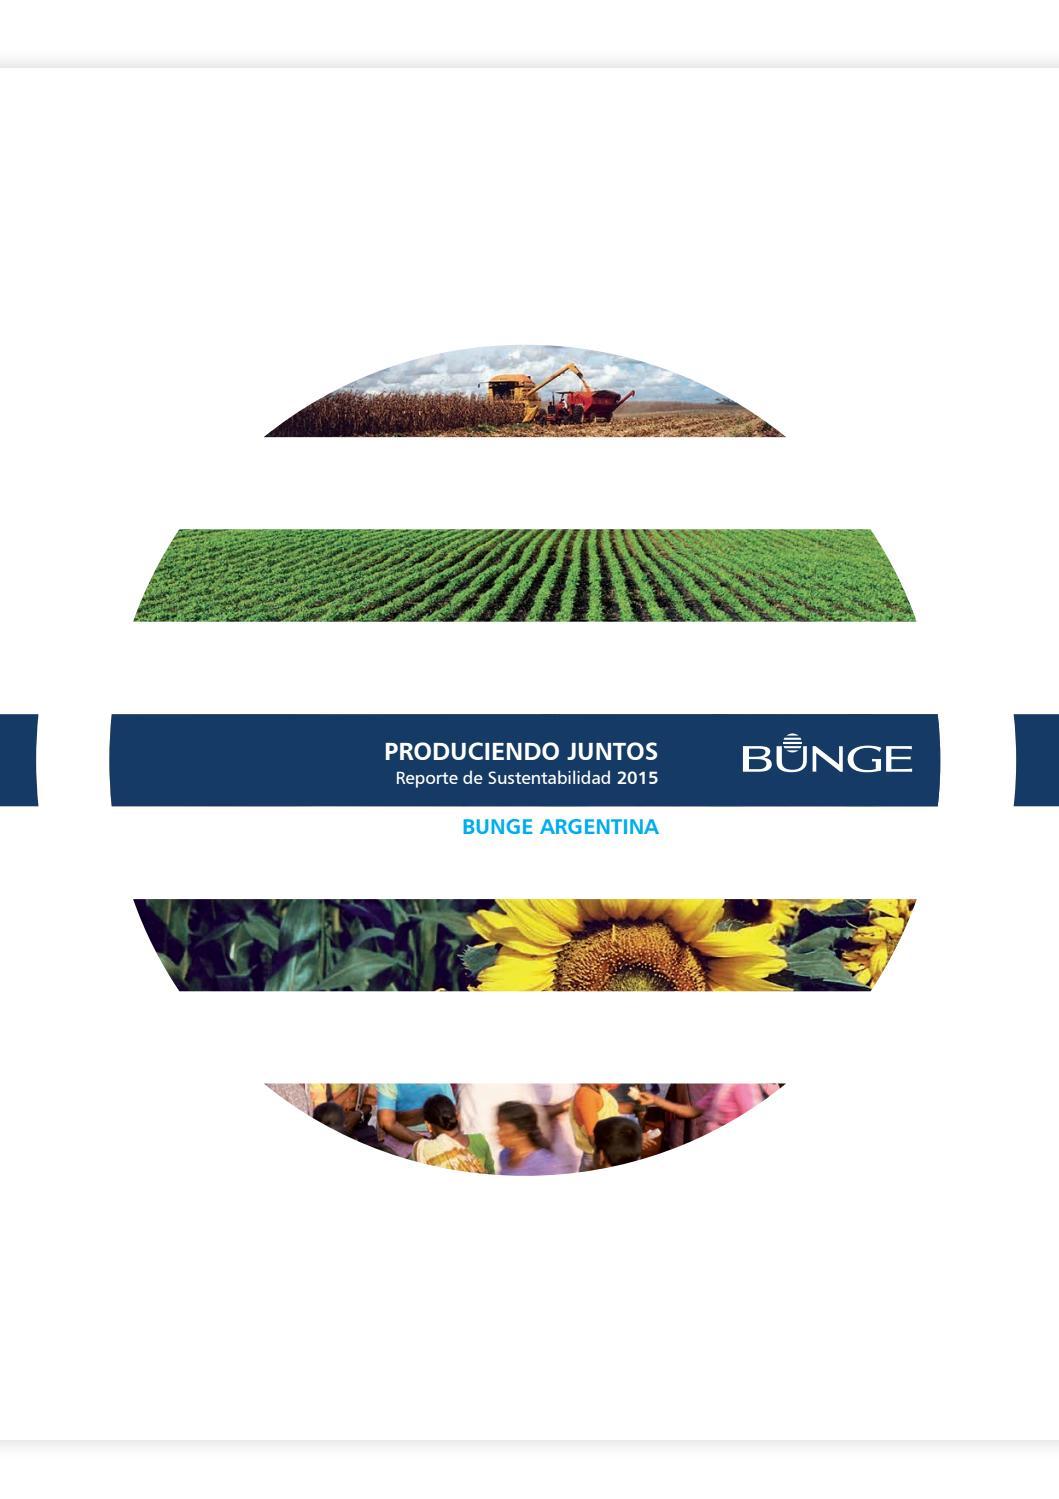 Bunge Argentina Reporte Sustentabilidad 2015 by Bunge Argentina - issuu